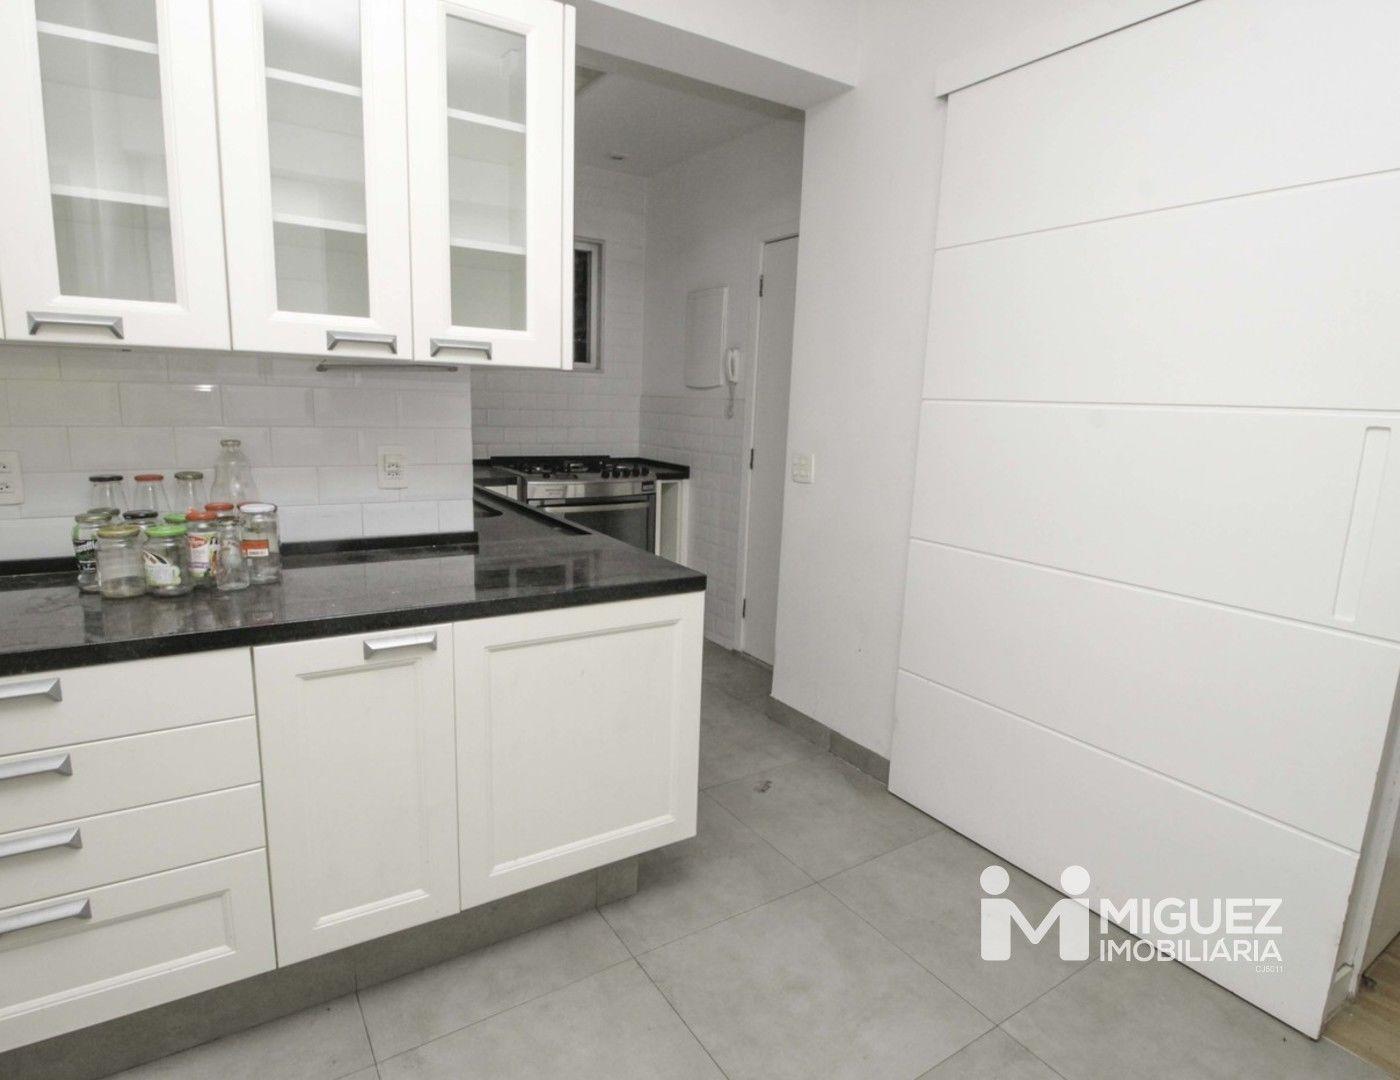 Apartamento, venda, Rua Doutor Satamini - Tijuca , Rio de janeiro